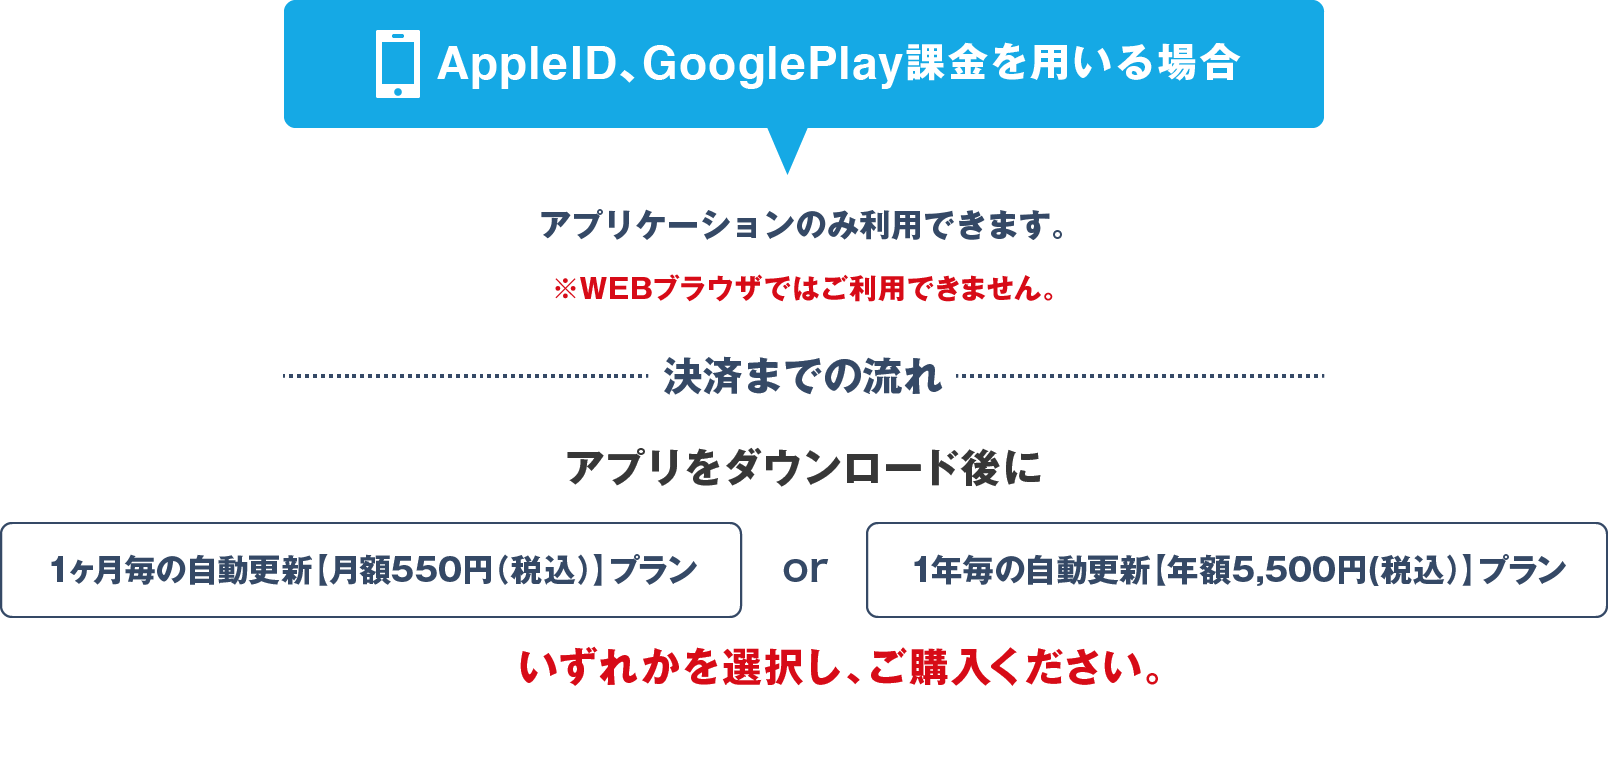 AppleID、GooglePlay課金を用いる場合